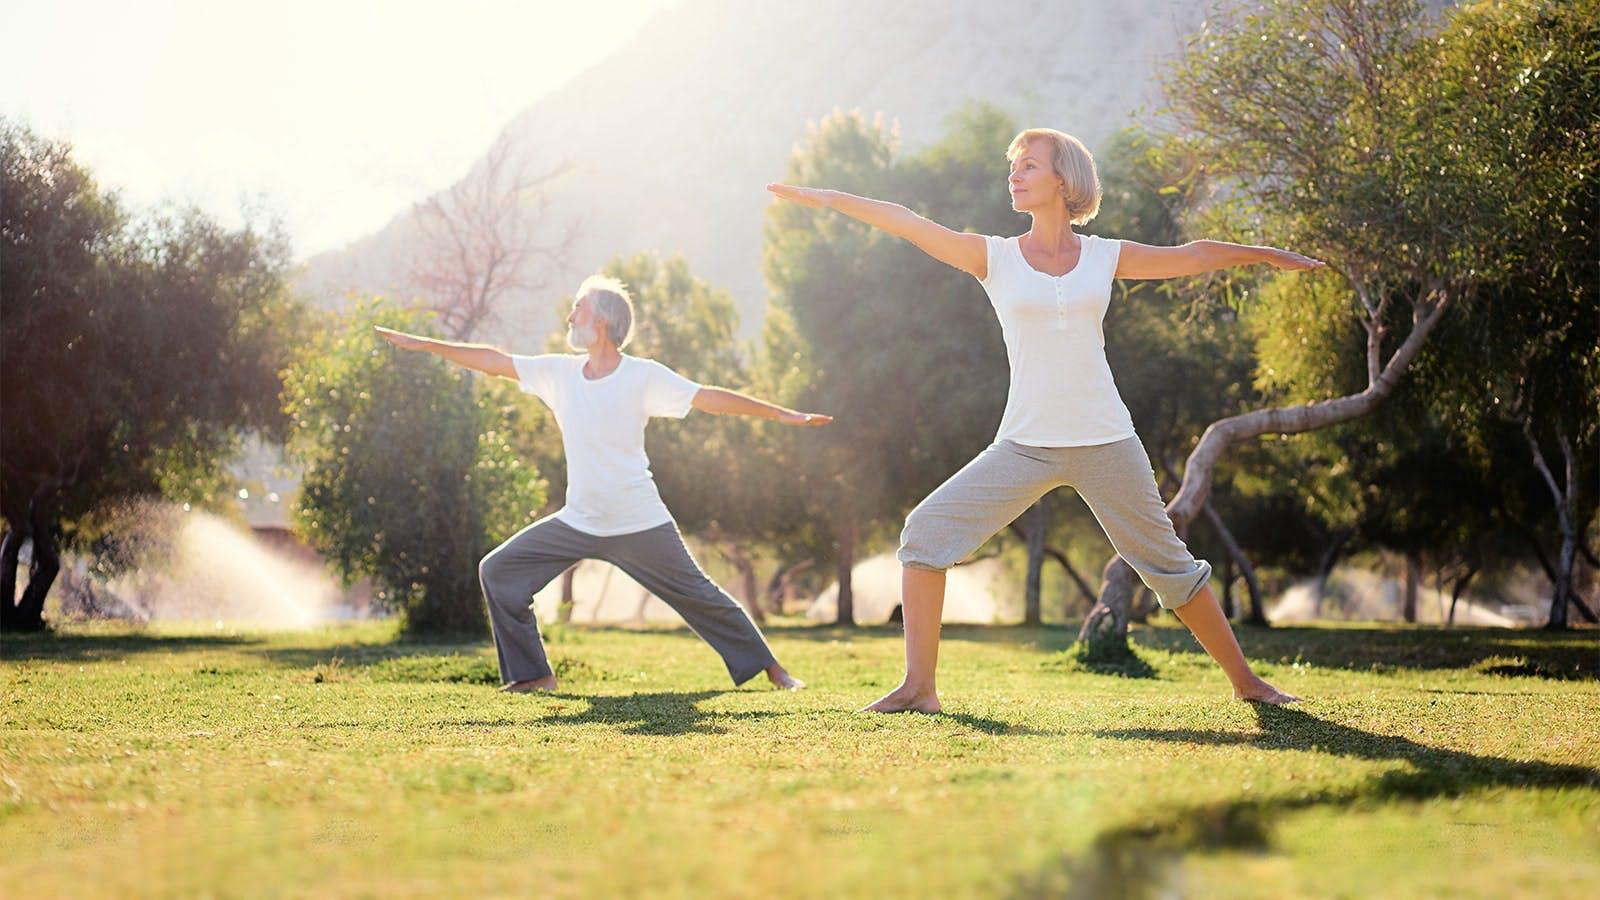 Elderly Care: Key to Happy Aging